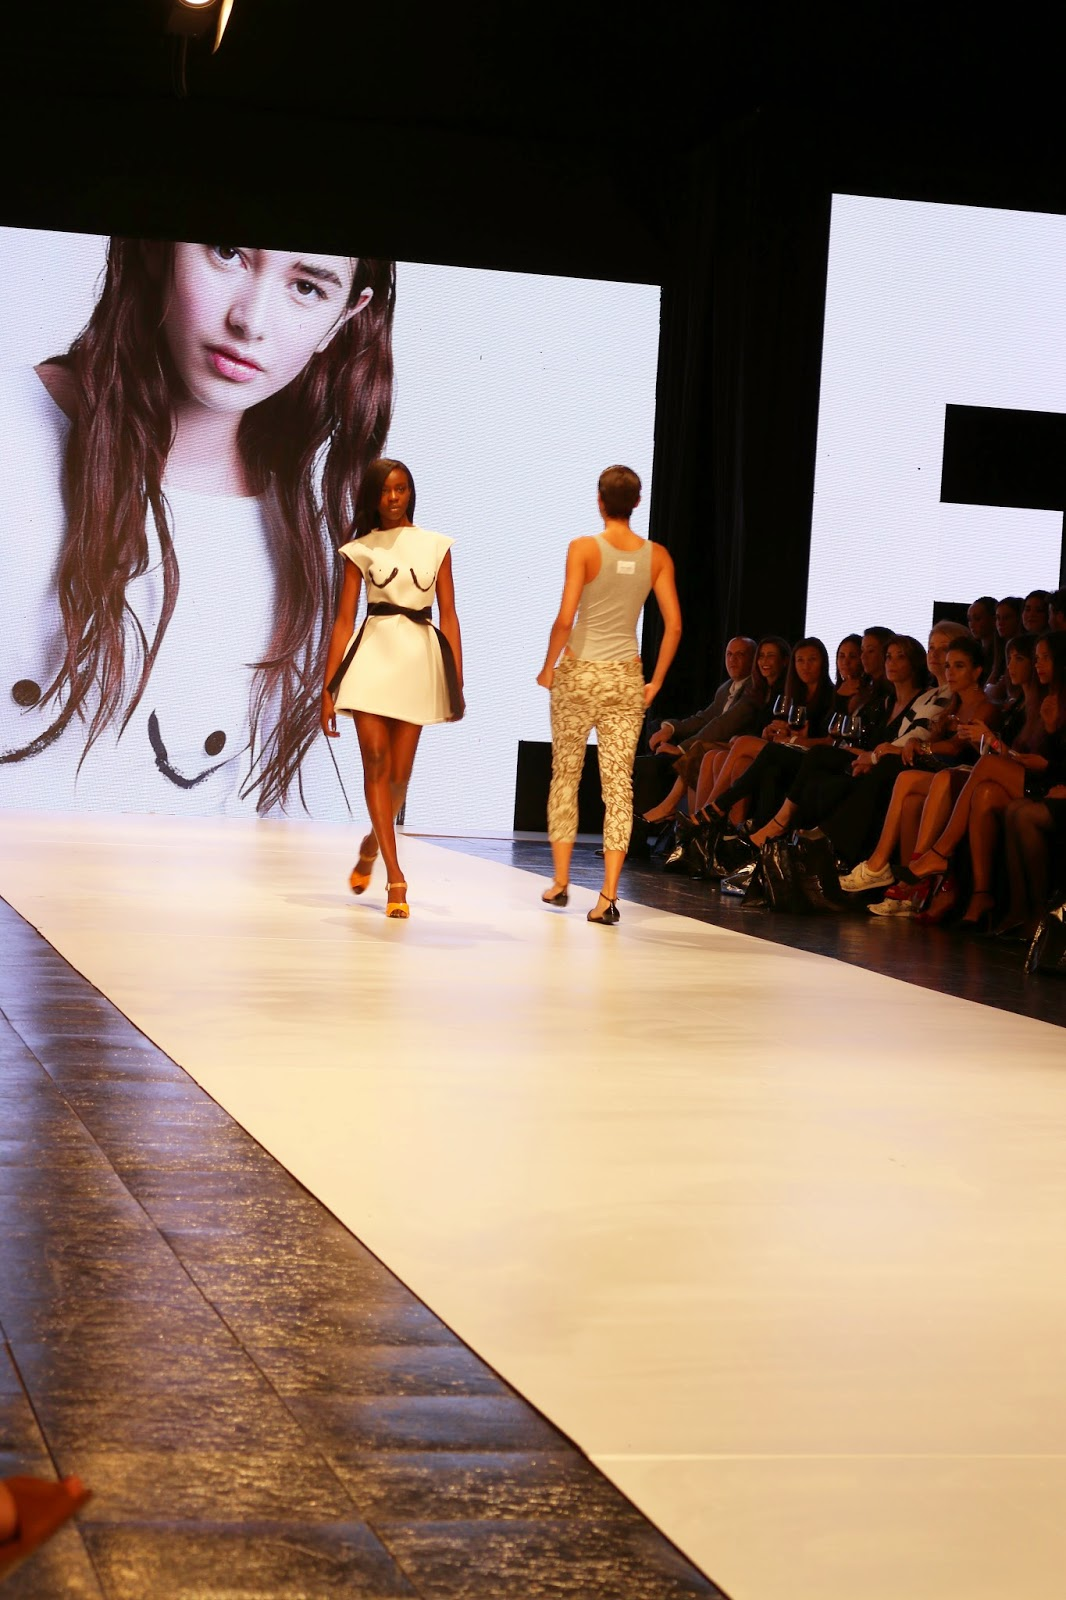 http://www.whitneyswonderland.com/2015/04/fashion-week-san-jose-day-2.html